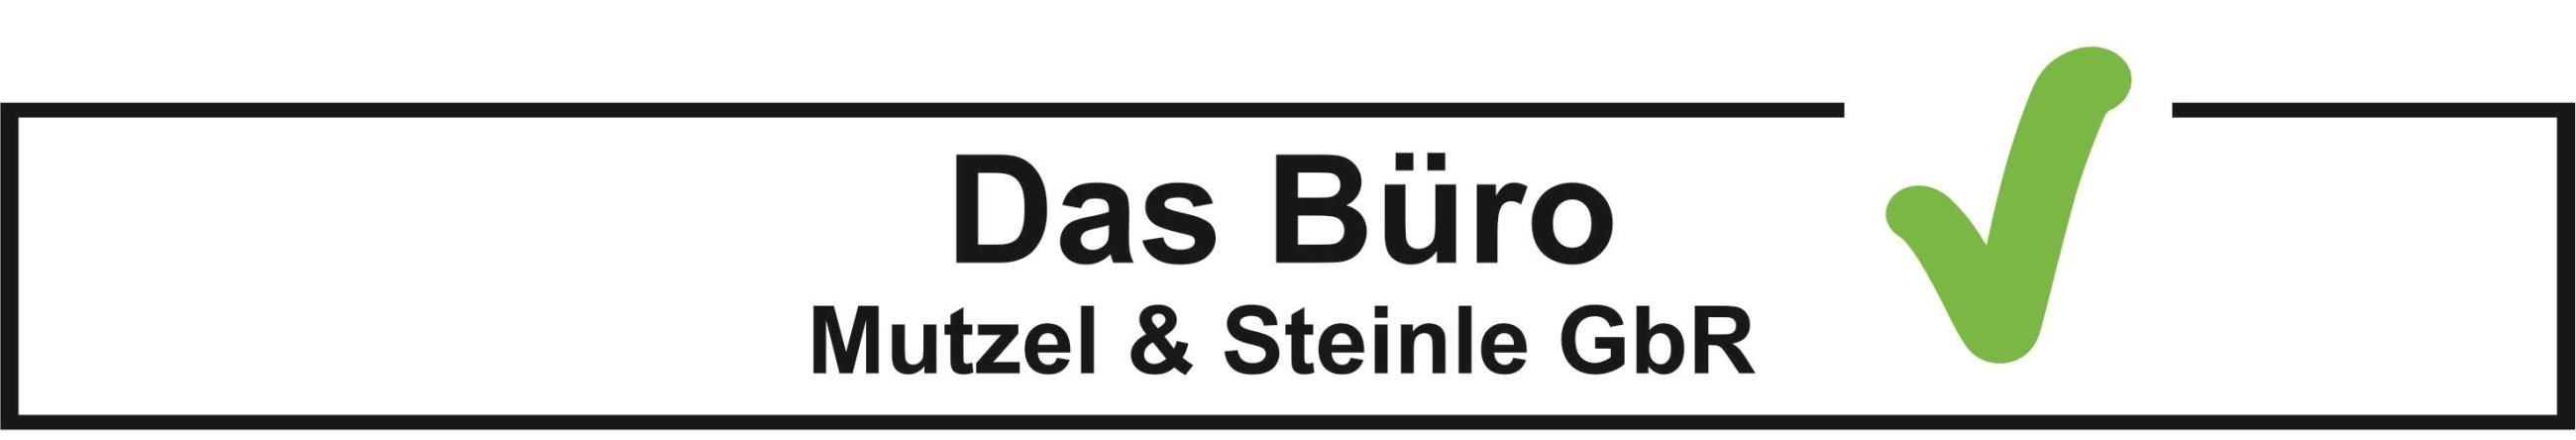 Das Büro Mutzel & Steinle GbR